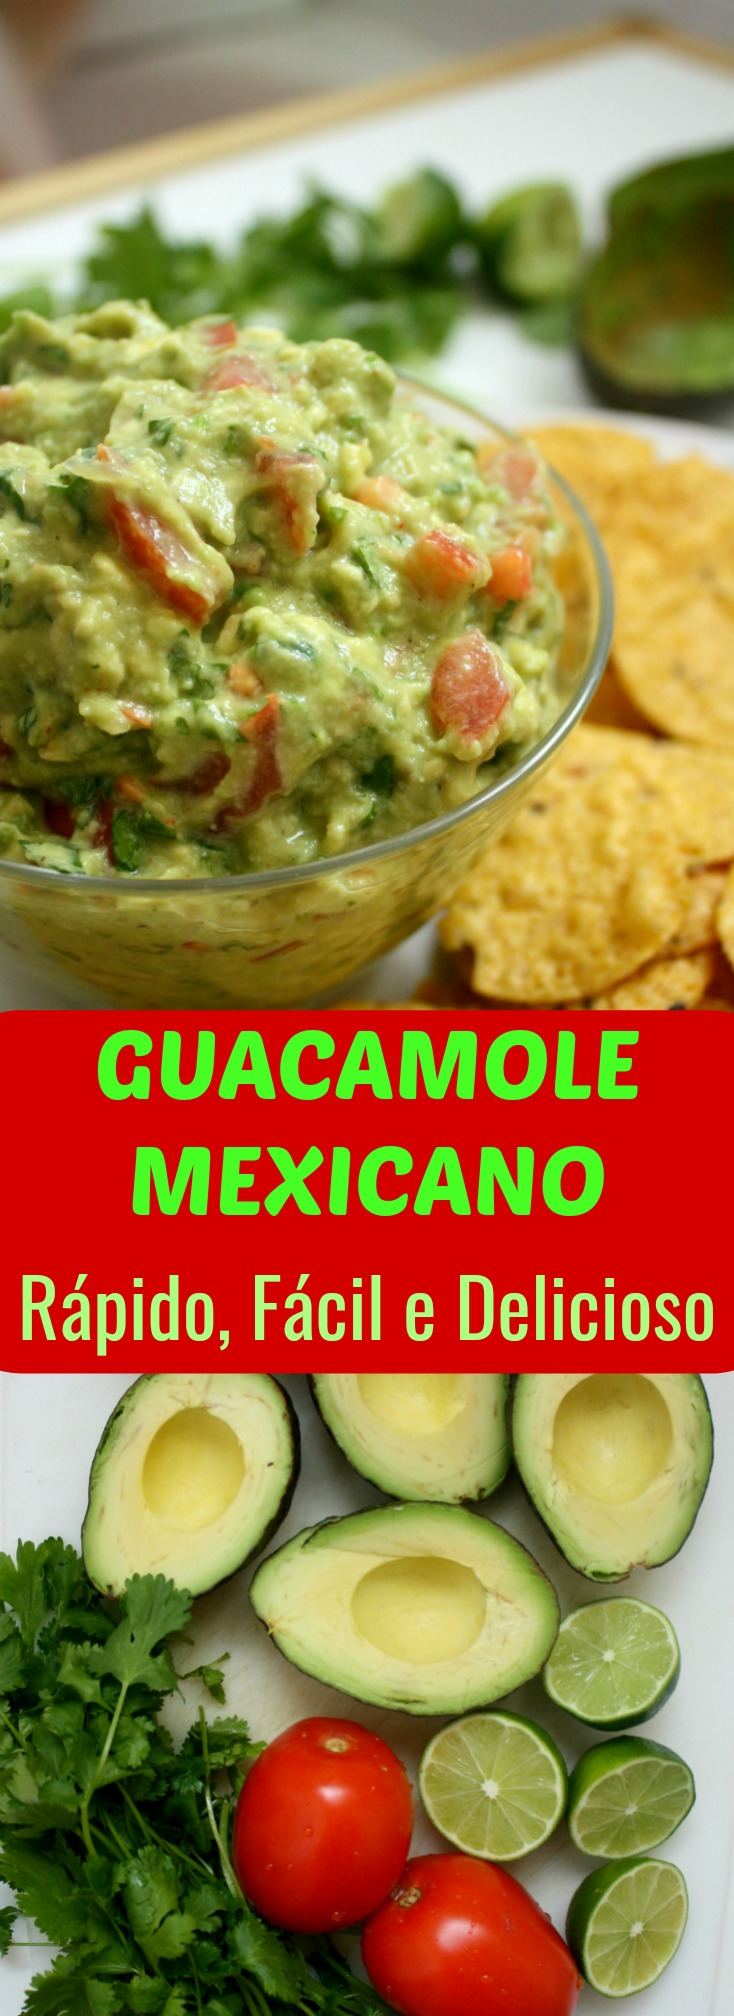 Guacamole Mexico! Rápido, Fácil e Delicioso! | acozinhaintolerante.com